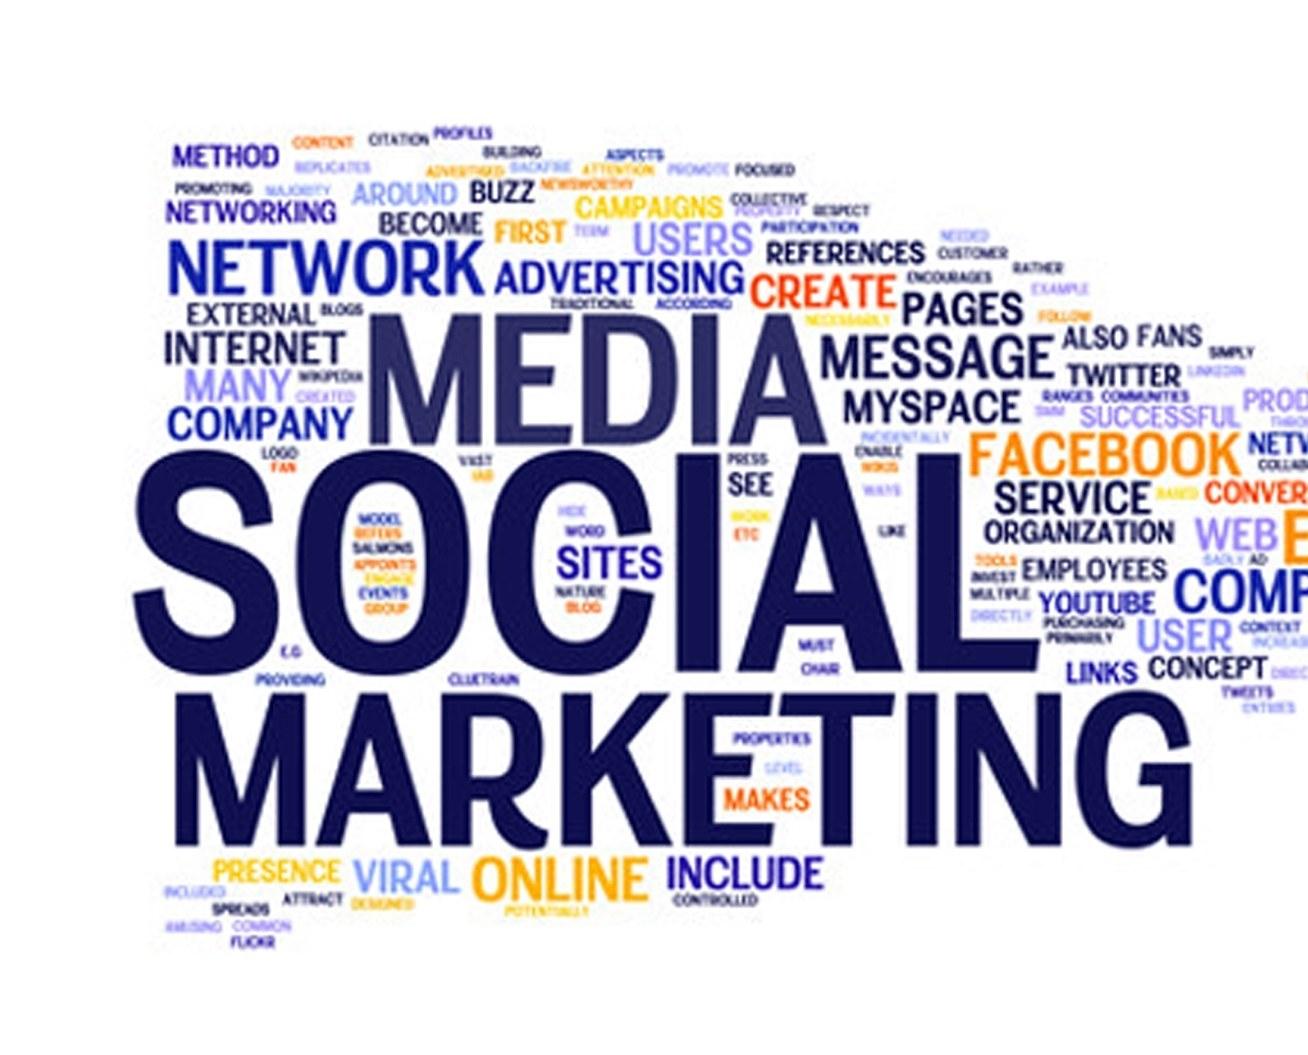 5 Social Media Marketing tips for Business